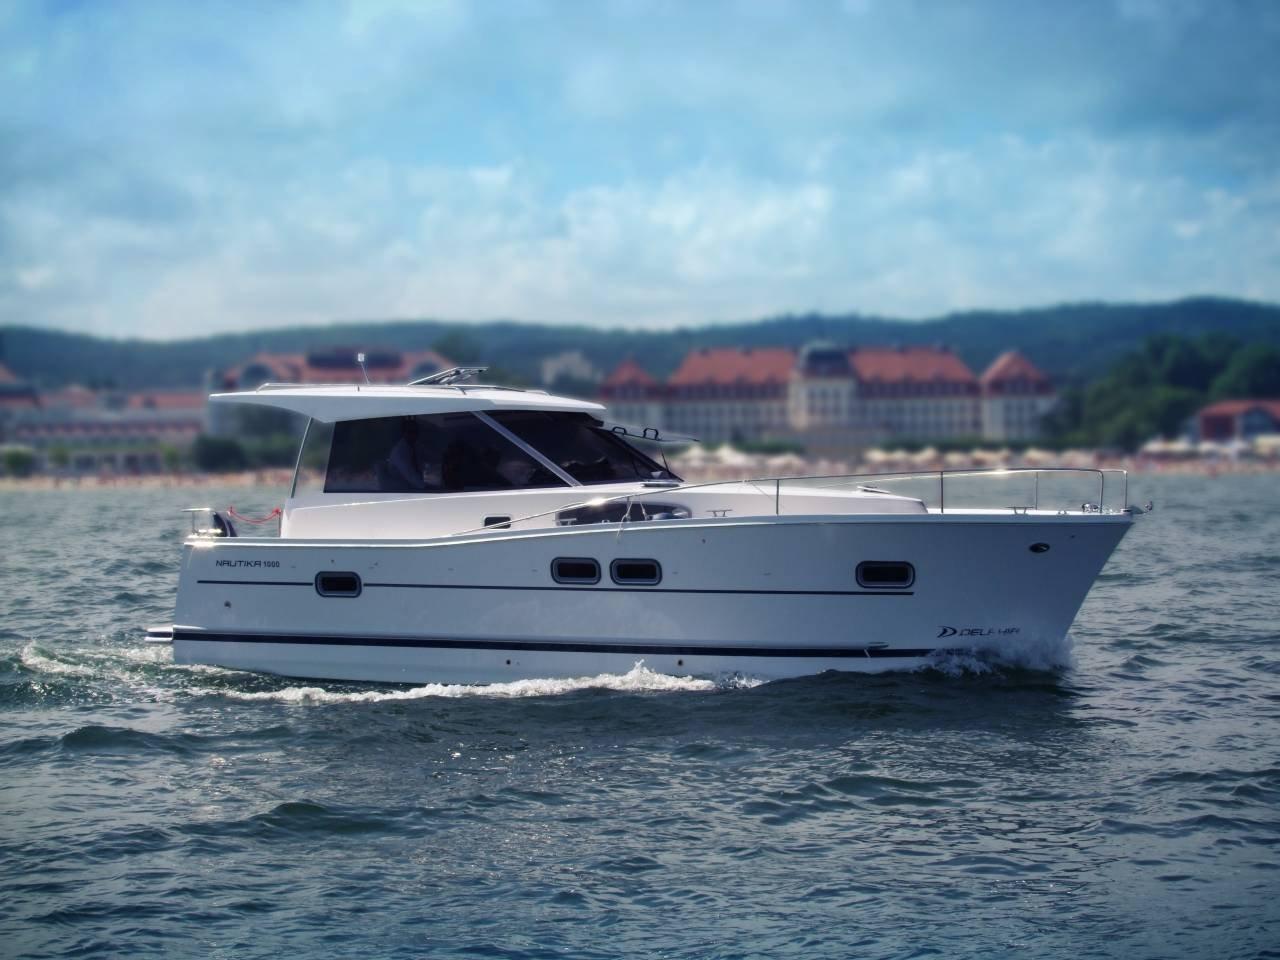 Nautika 1000 – jacht spacerowy (houseboat)